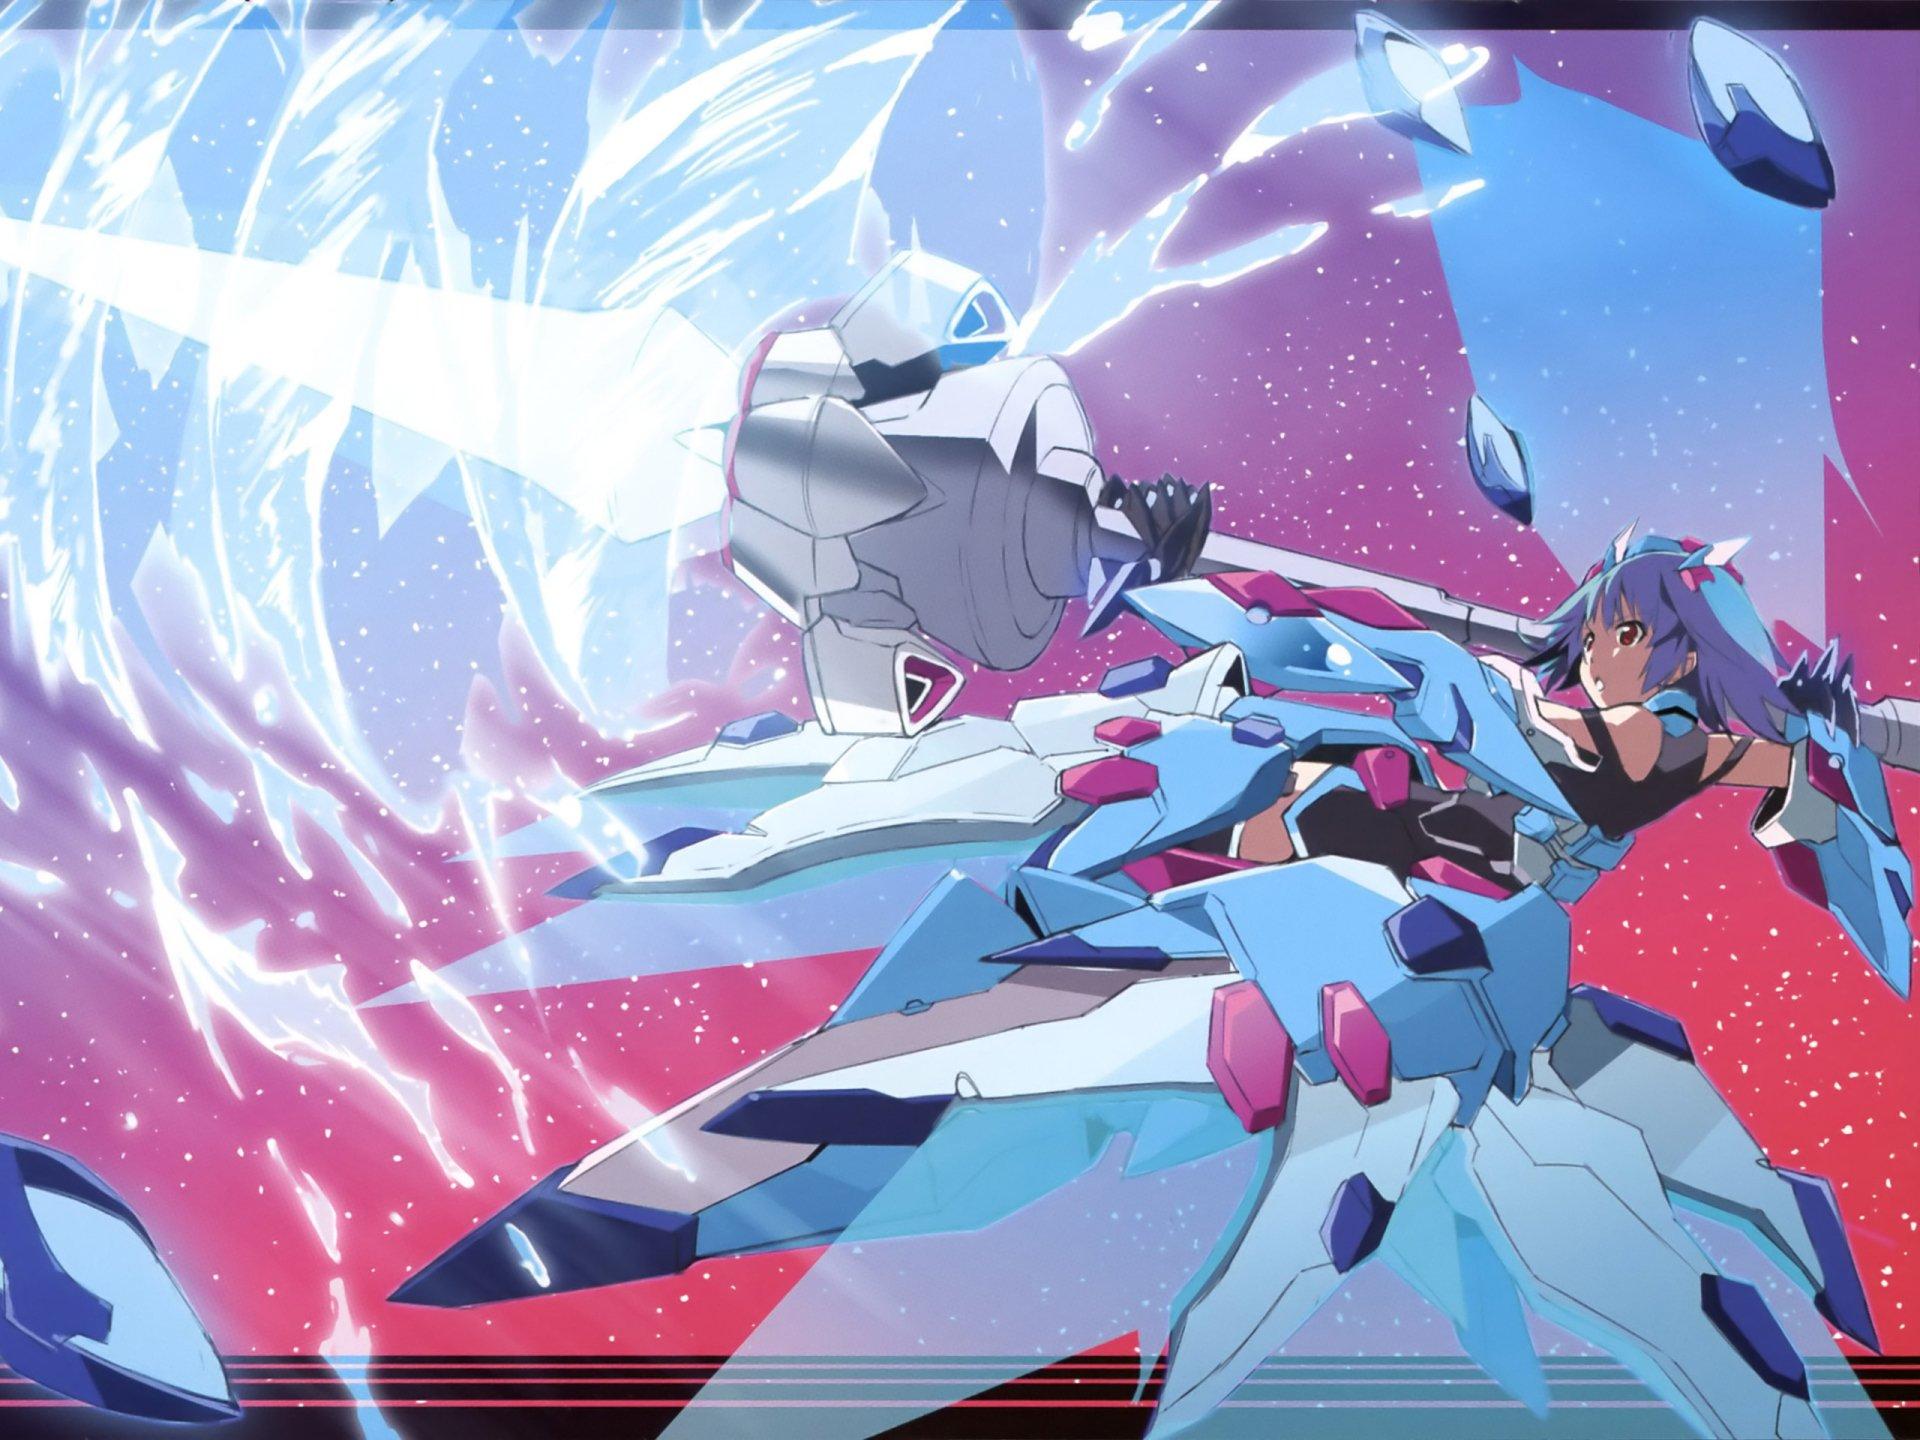 Katana Wallpaper Hd Infinite Stratos Hd Wallpaper Background Image